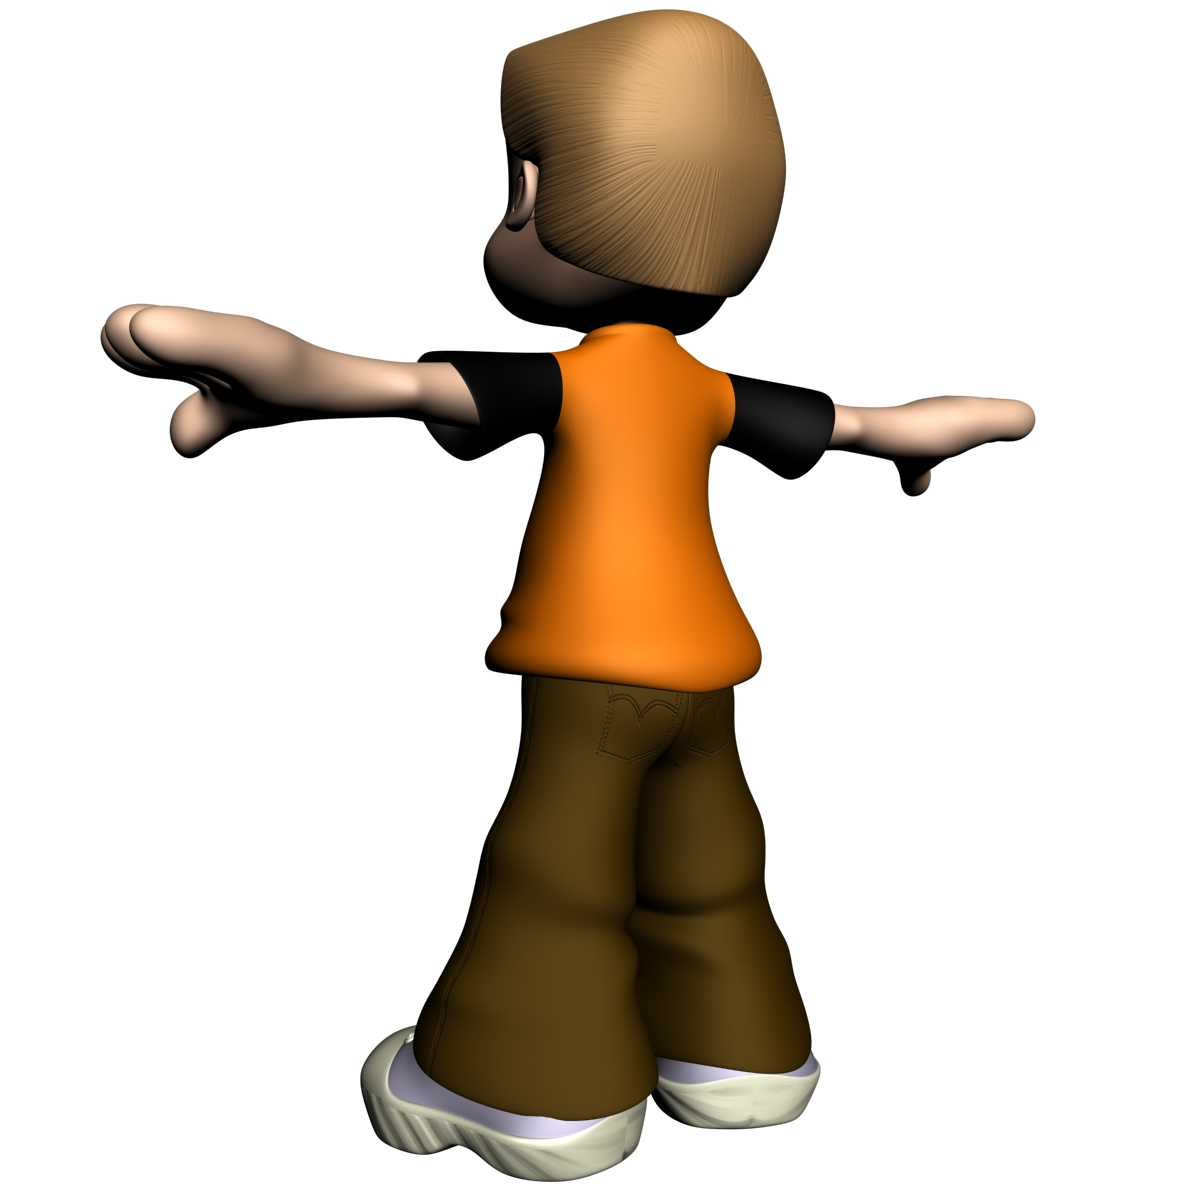 Cartoon Boy Rigged 3d Model - Cartoon-boy-images-free